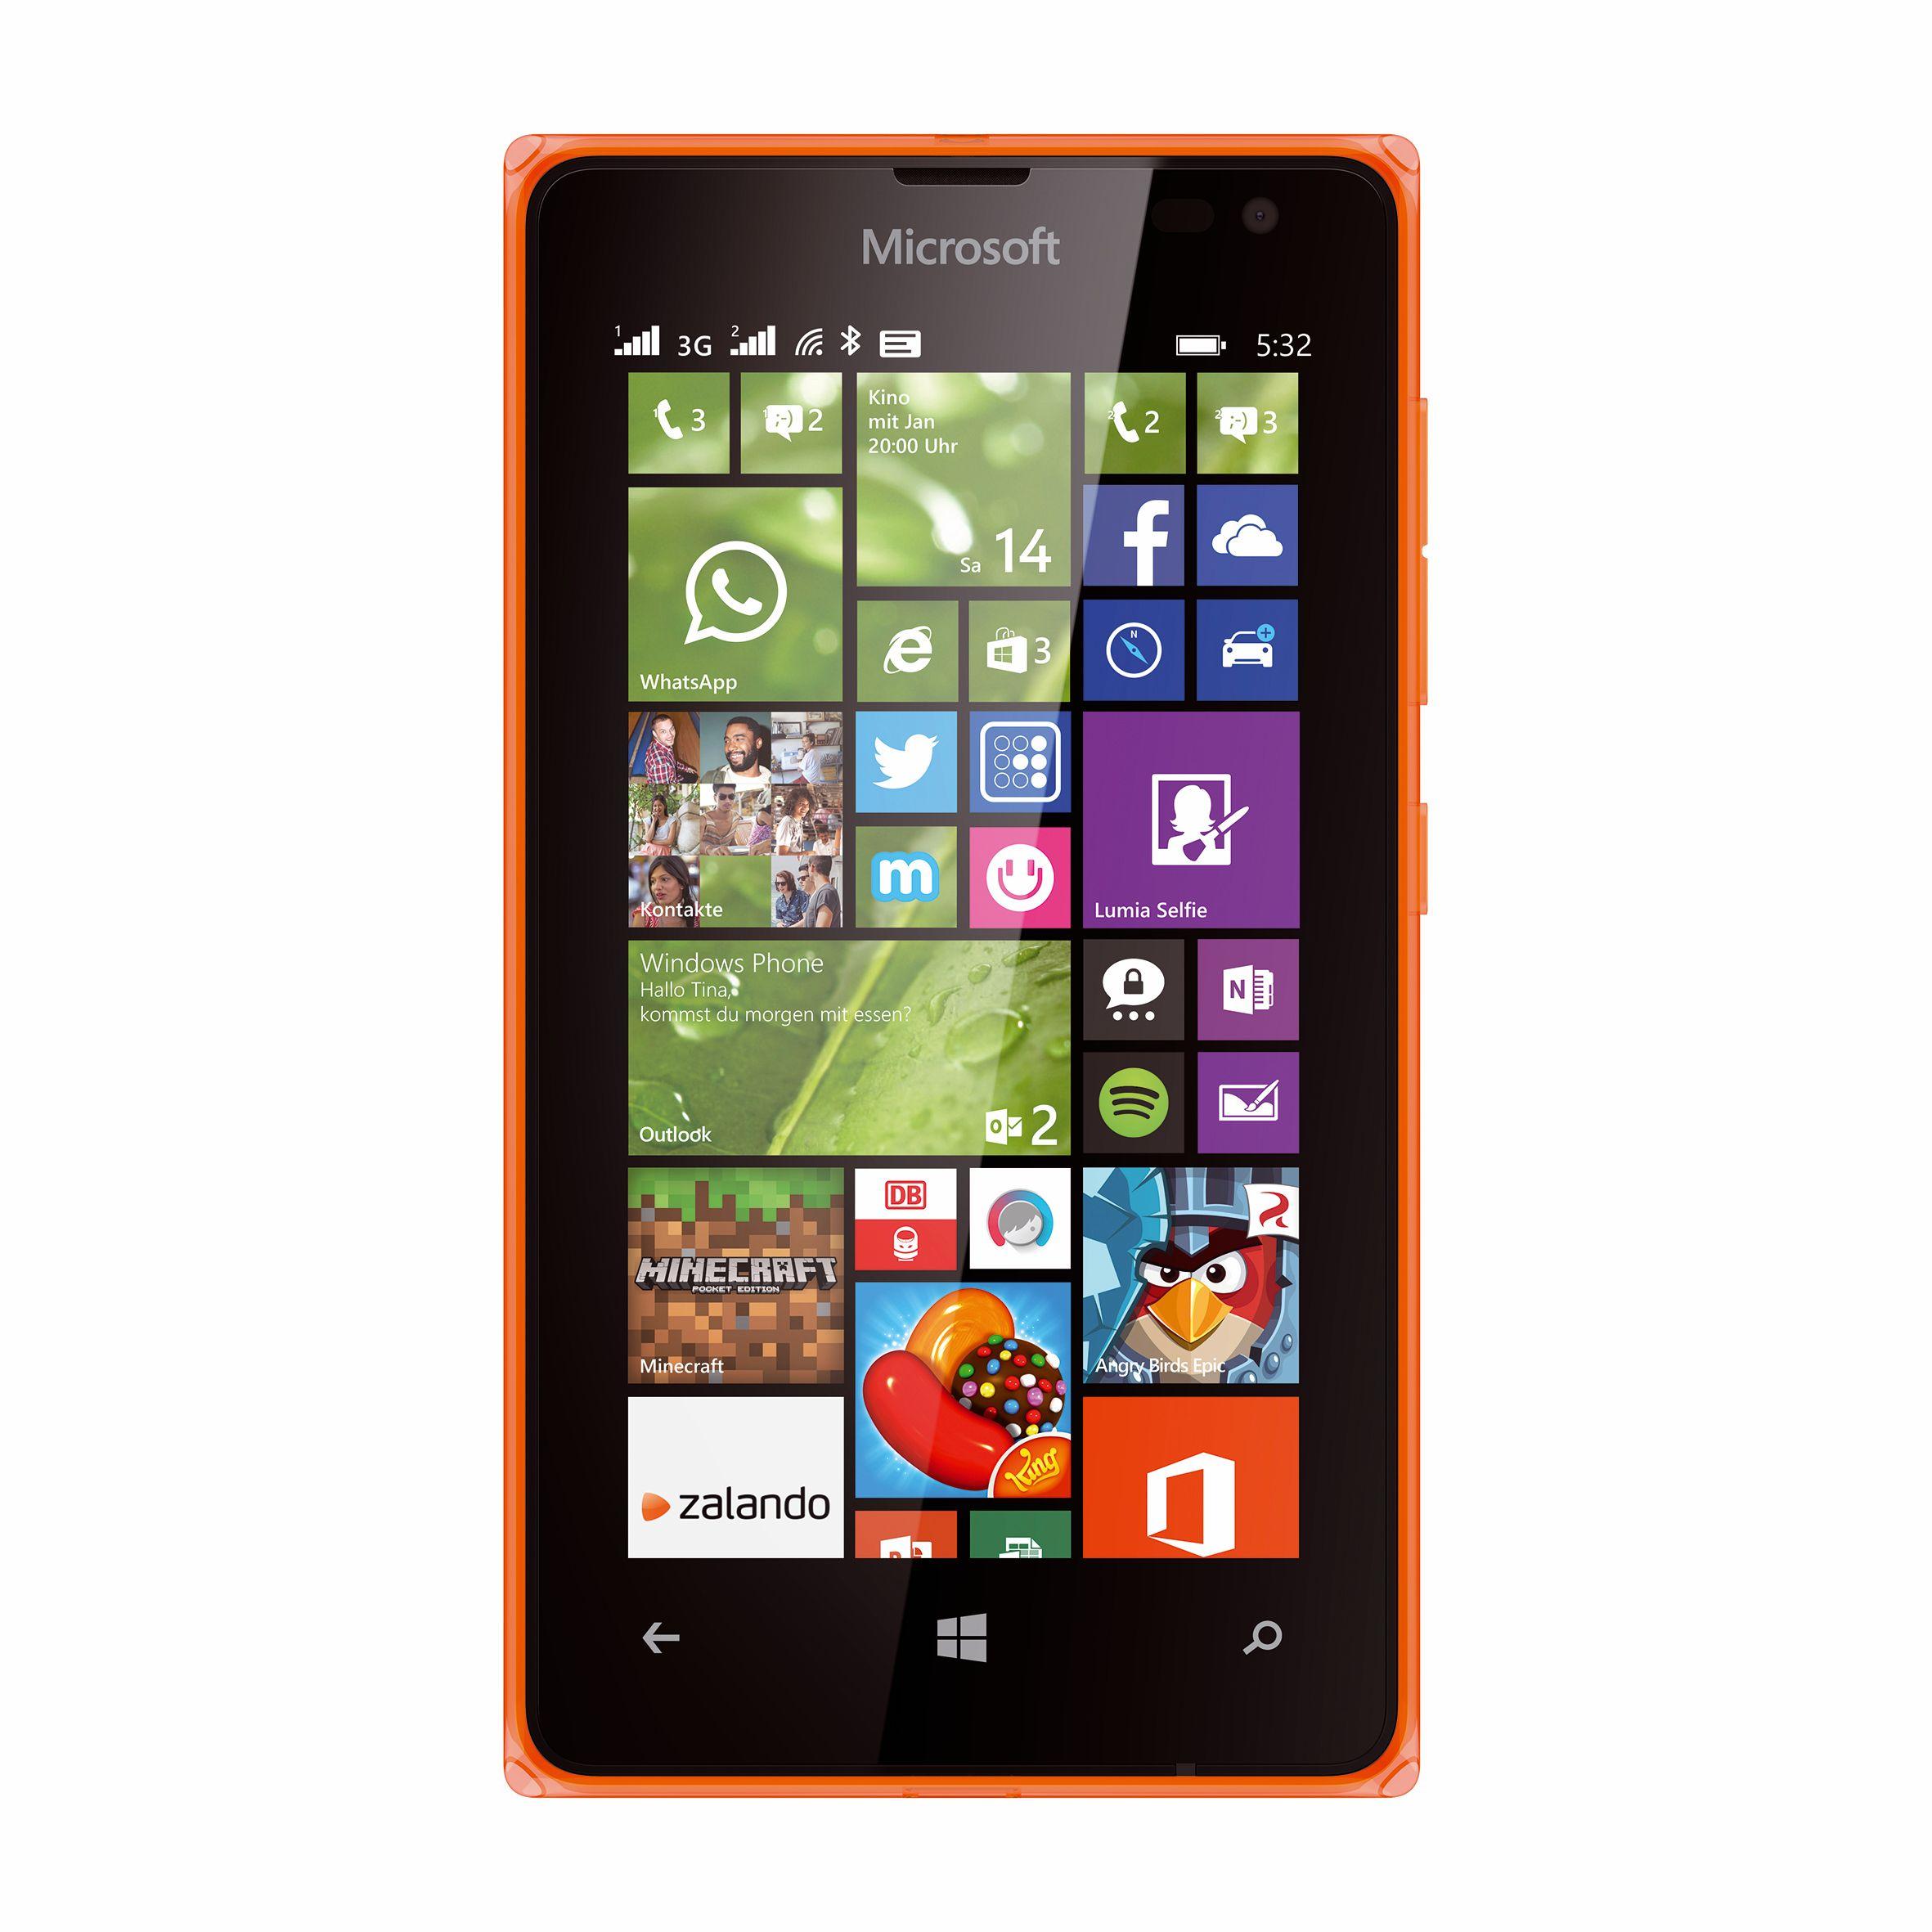 Lumia 435 und Lumia 532: Zwei Windows-Phone-Smartphones für unter 100 Euro - Lumia 532 (Bild: Microsoft)